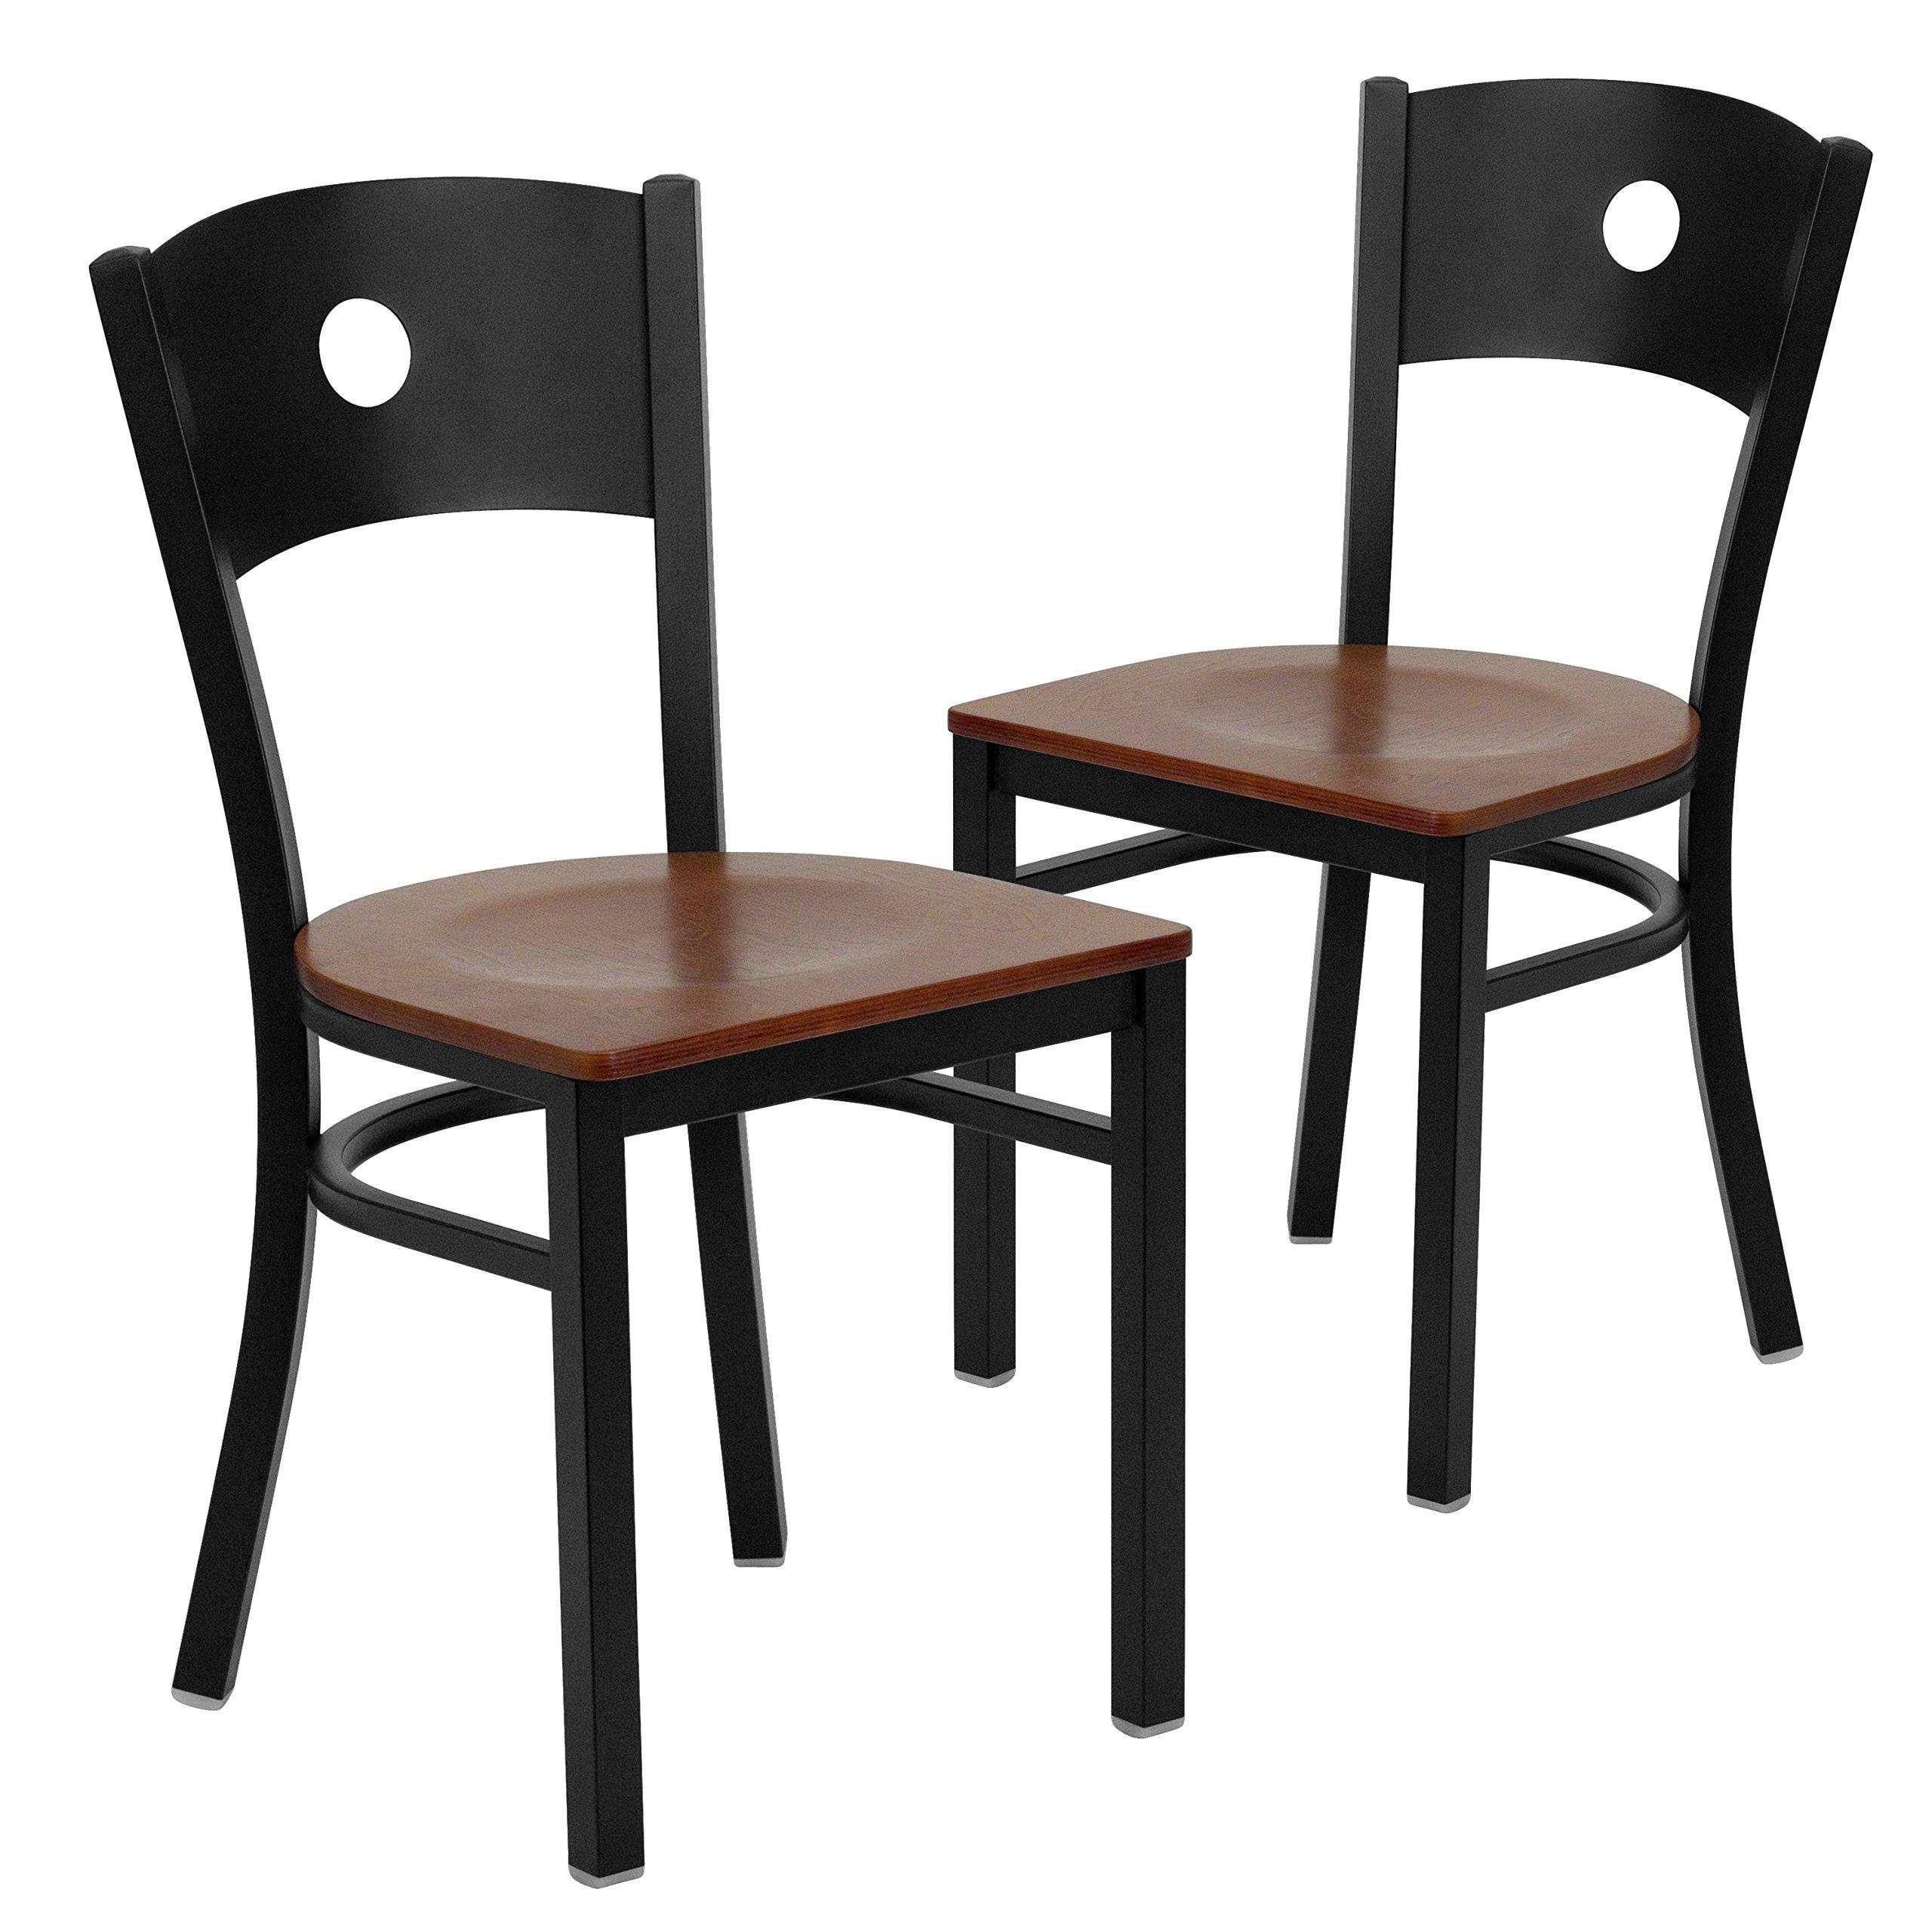 Flash Furniture 2 Pk. HERCULES Series Black Circle Back Metal Restaurant Chair - Cherry Wood Seat by Flash Furniture (Image #1)